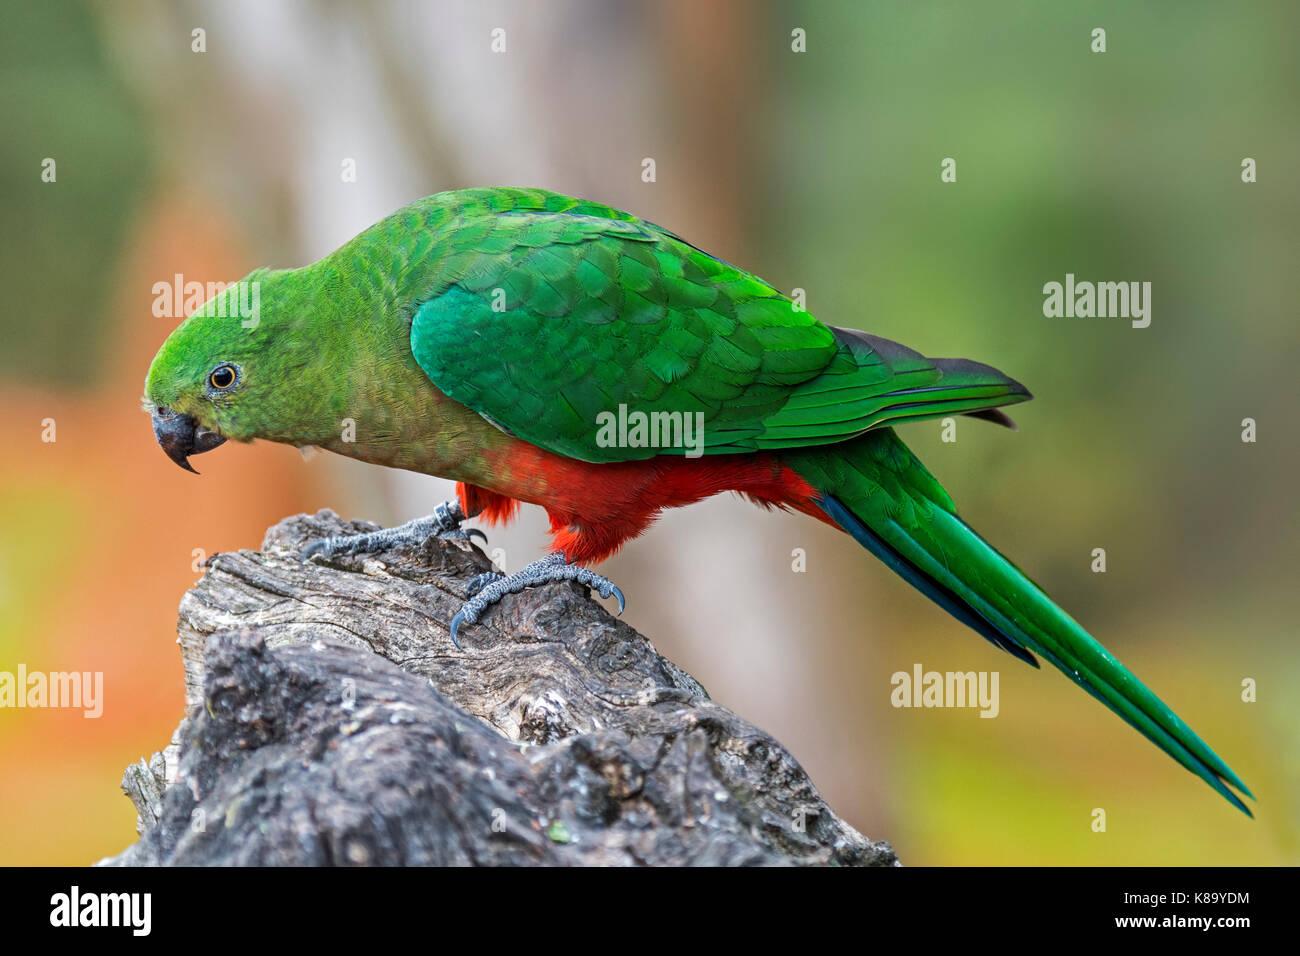 Australian king parrot (Alisterus scapularis) female, native to eastern Australia - Stock Image